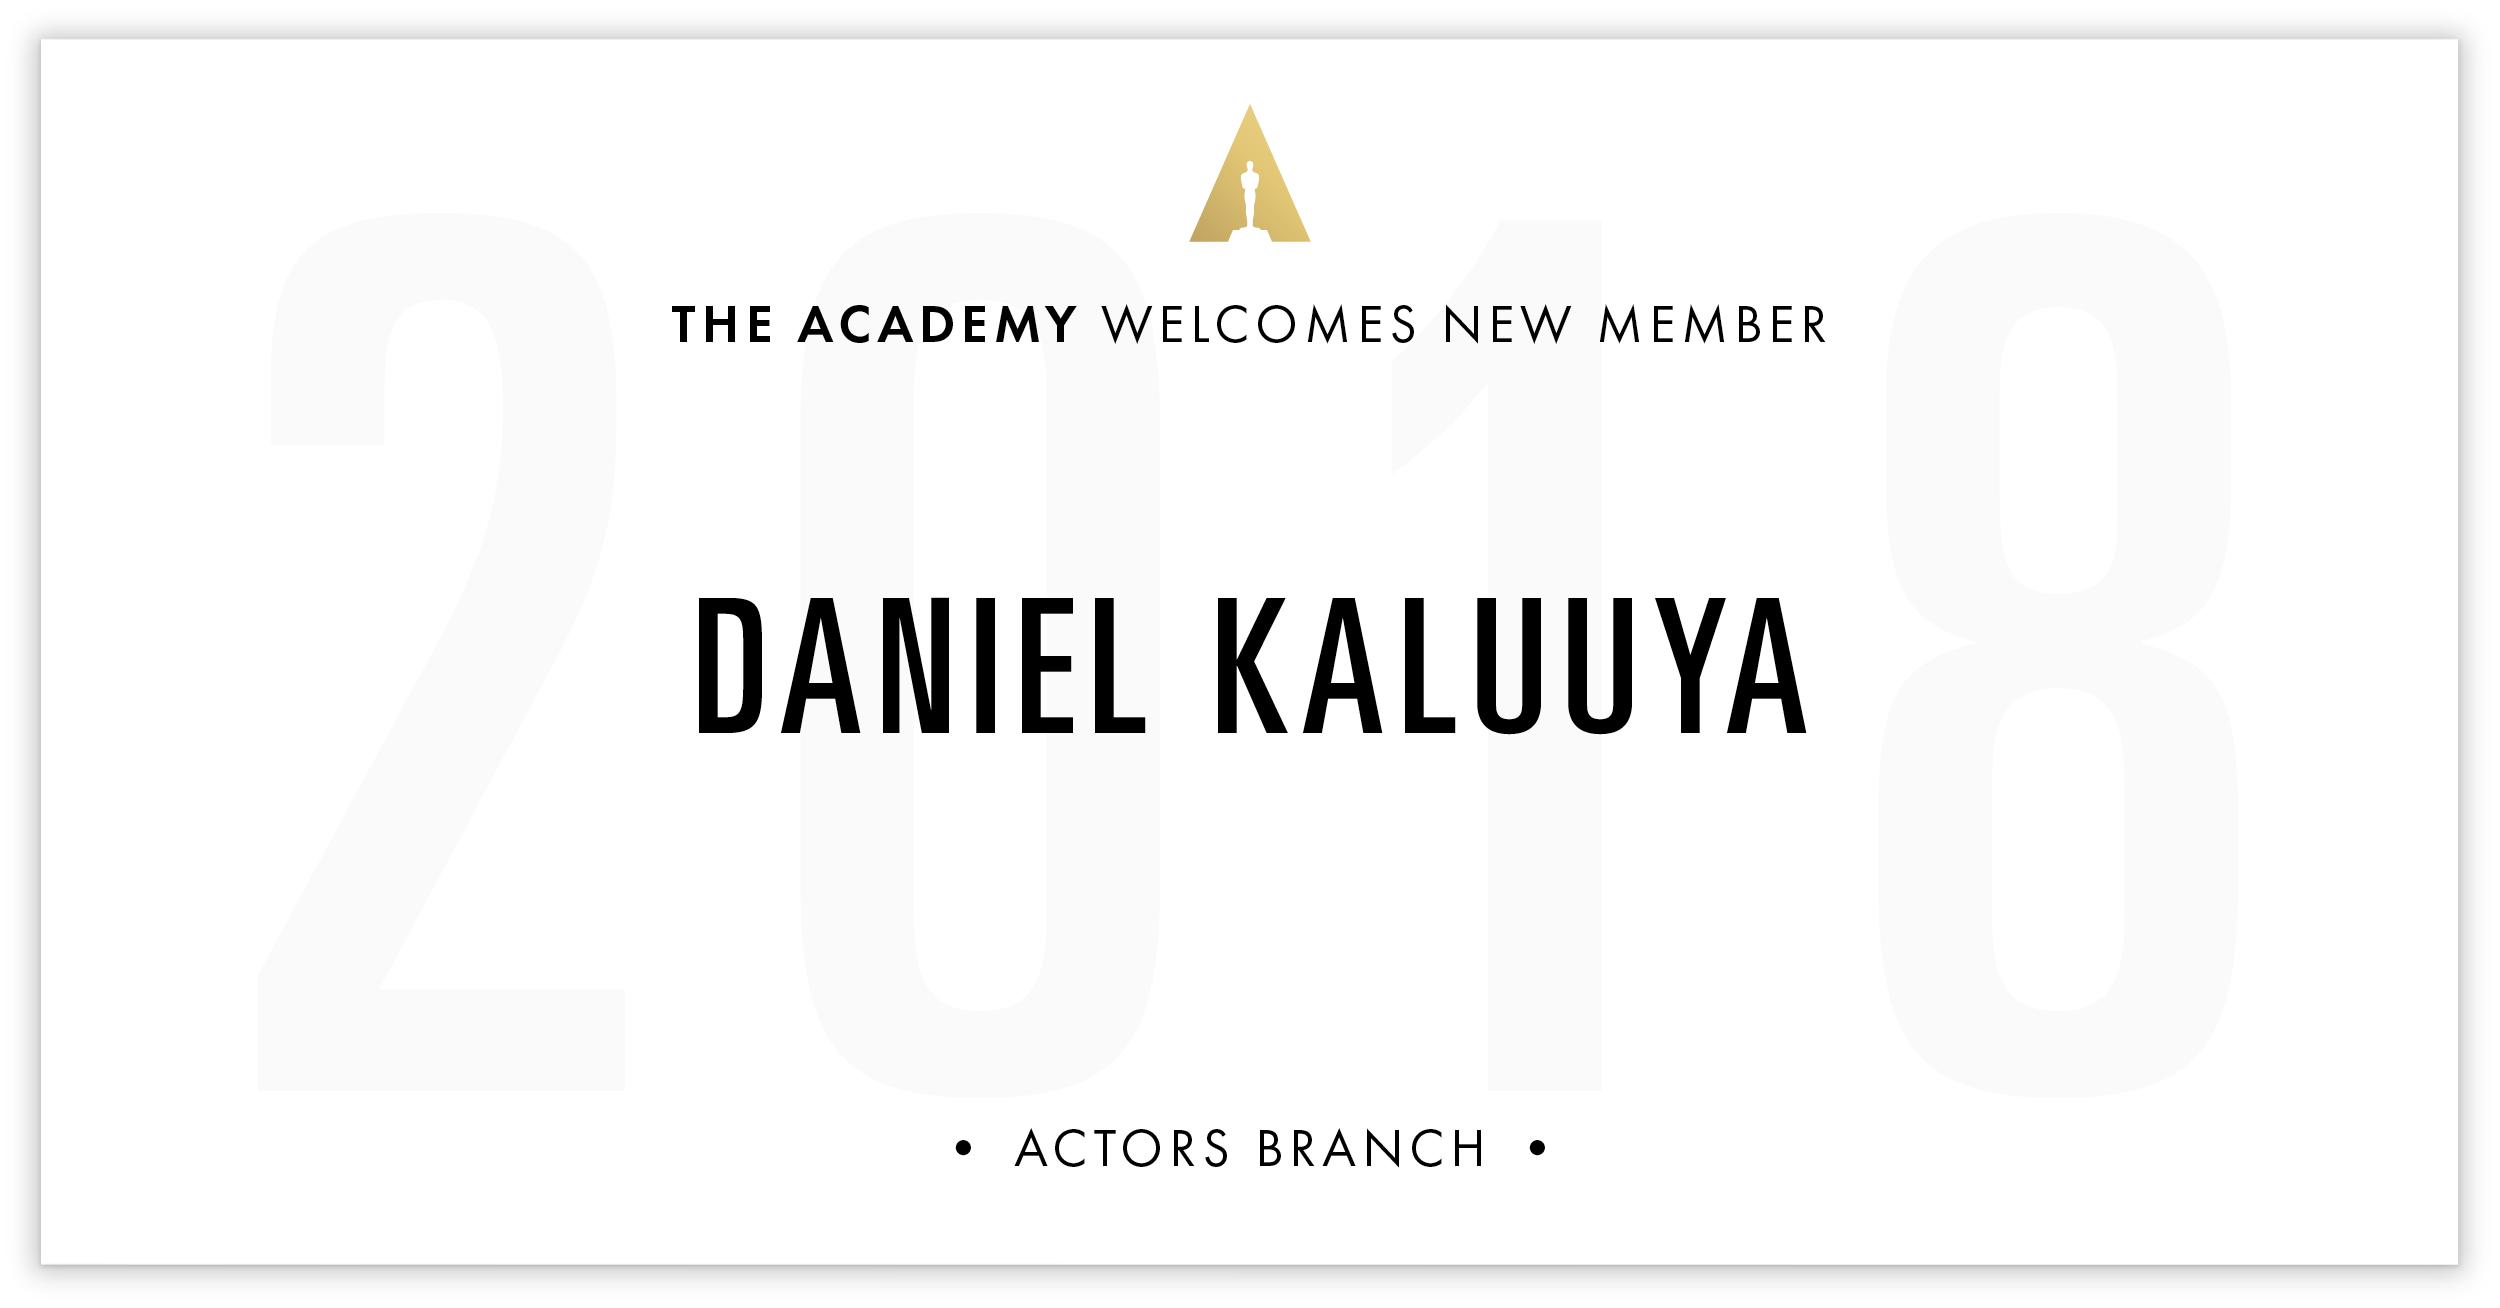 Daniel Kaluuya is invited!